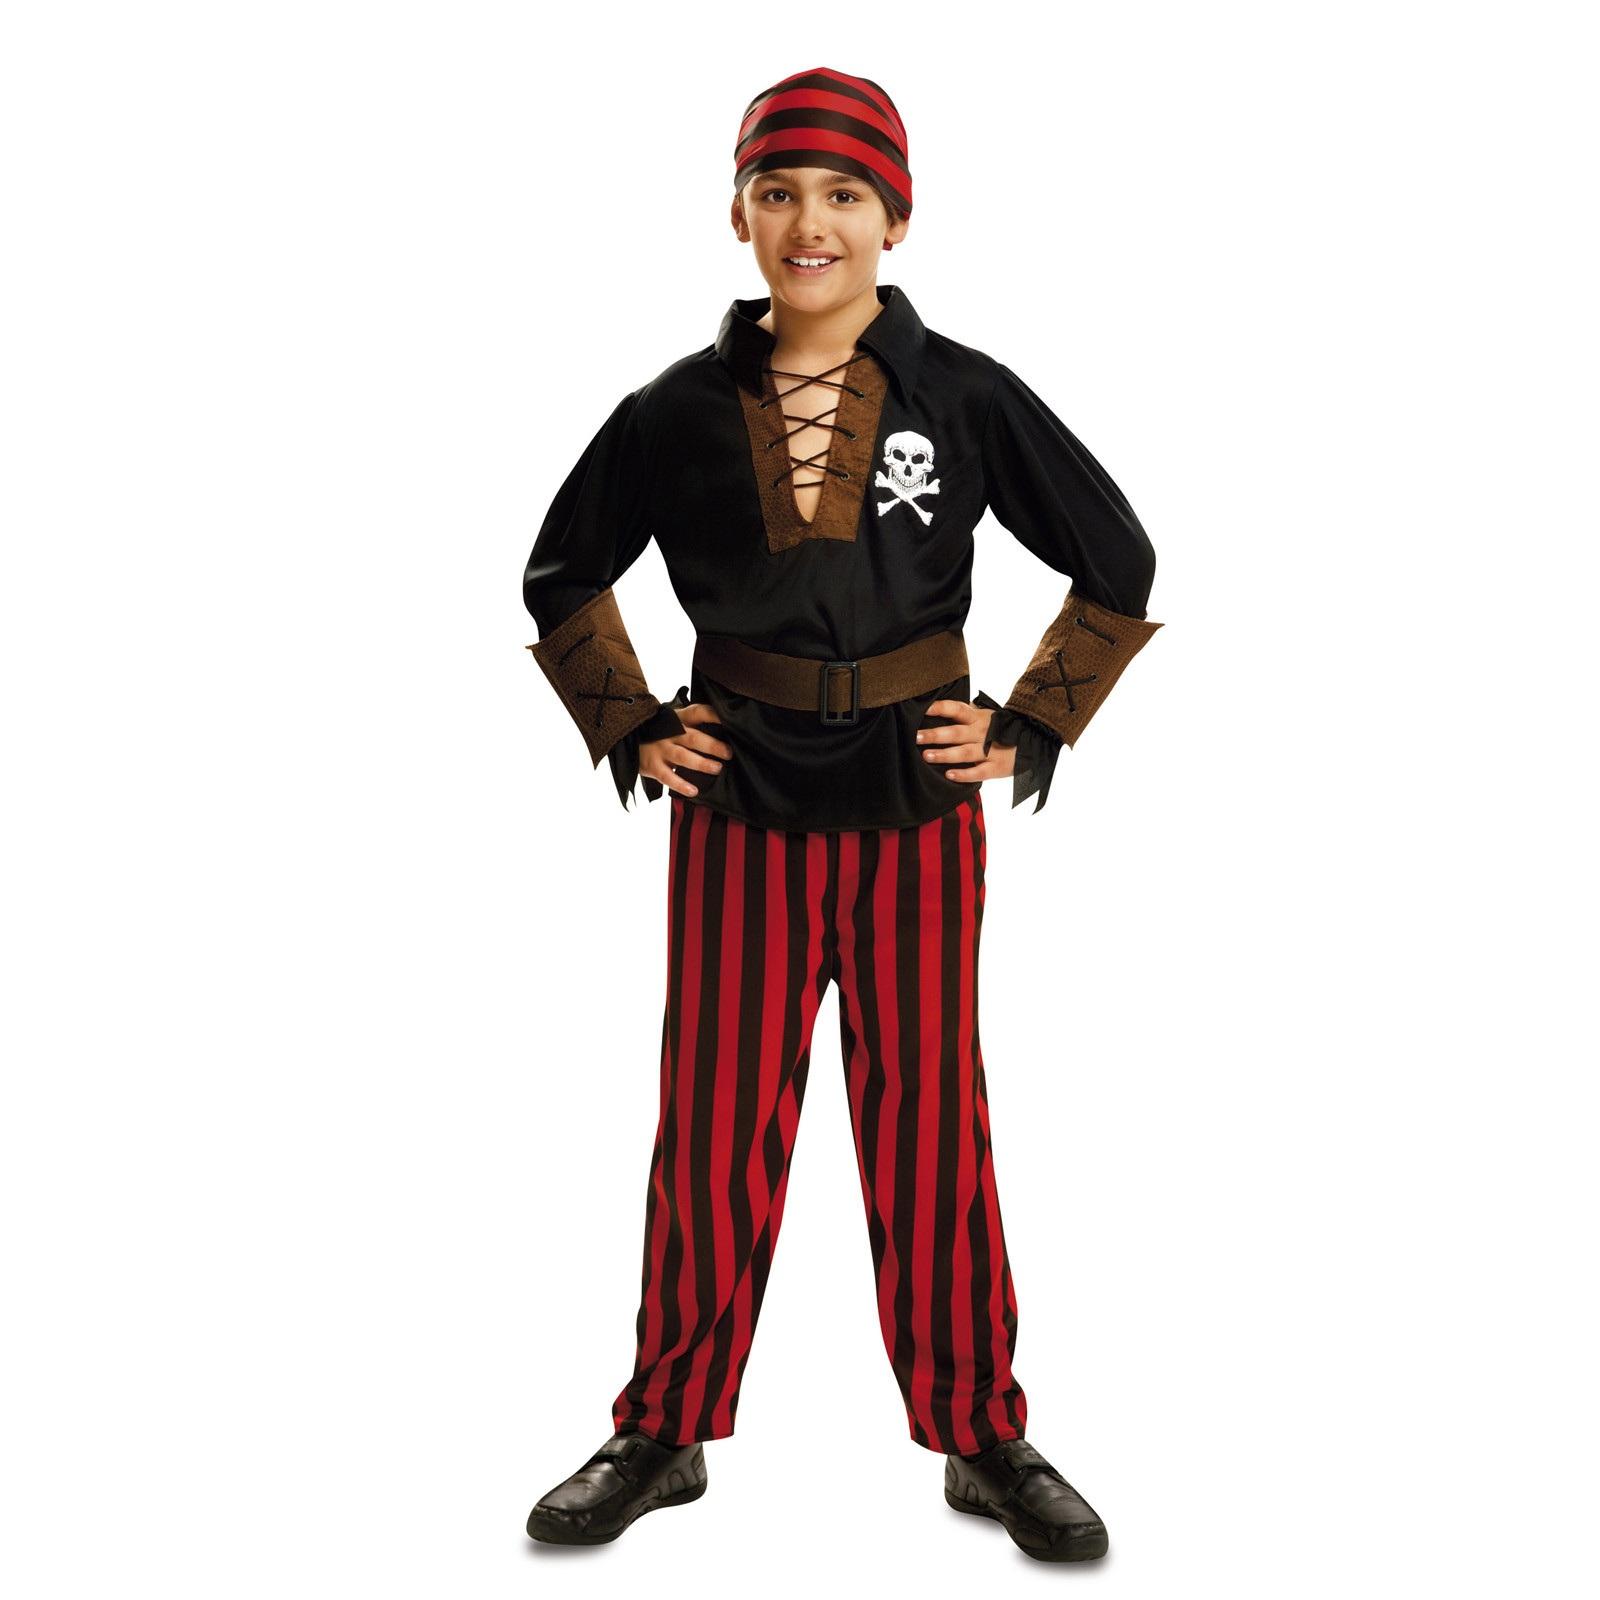 disfraz pirata bandana niño 200589mom - DISFRAZ DE PIRATA BANDANA NIÑO